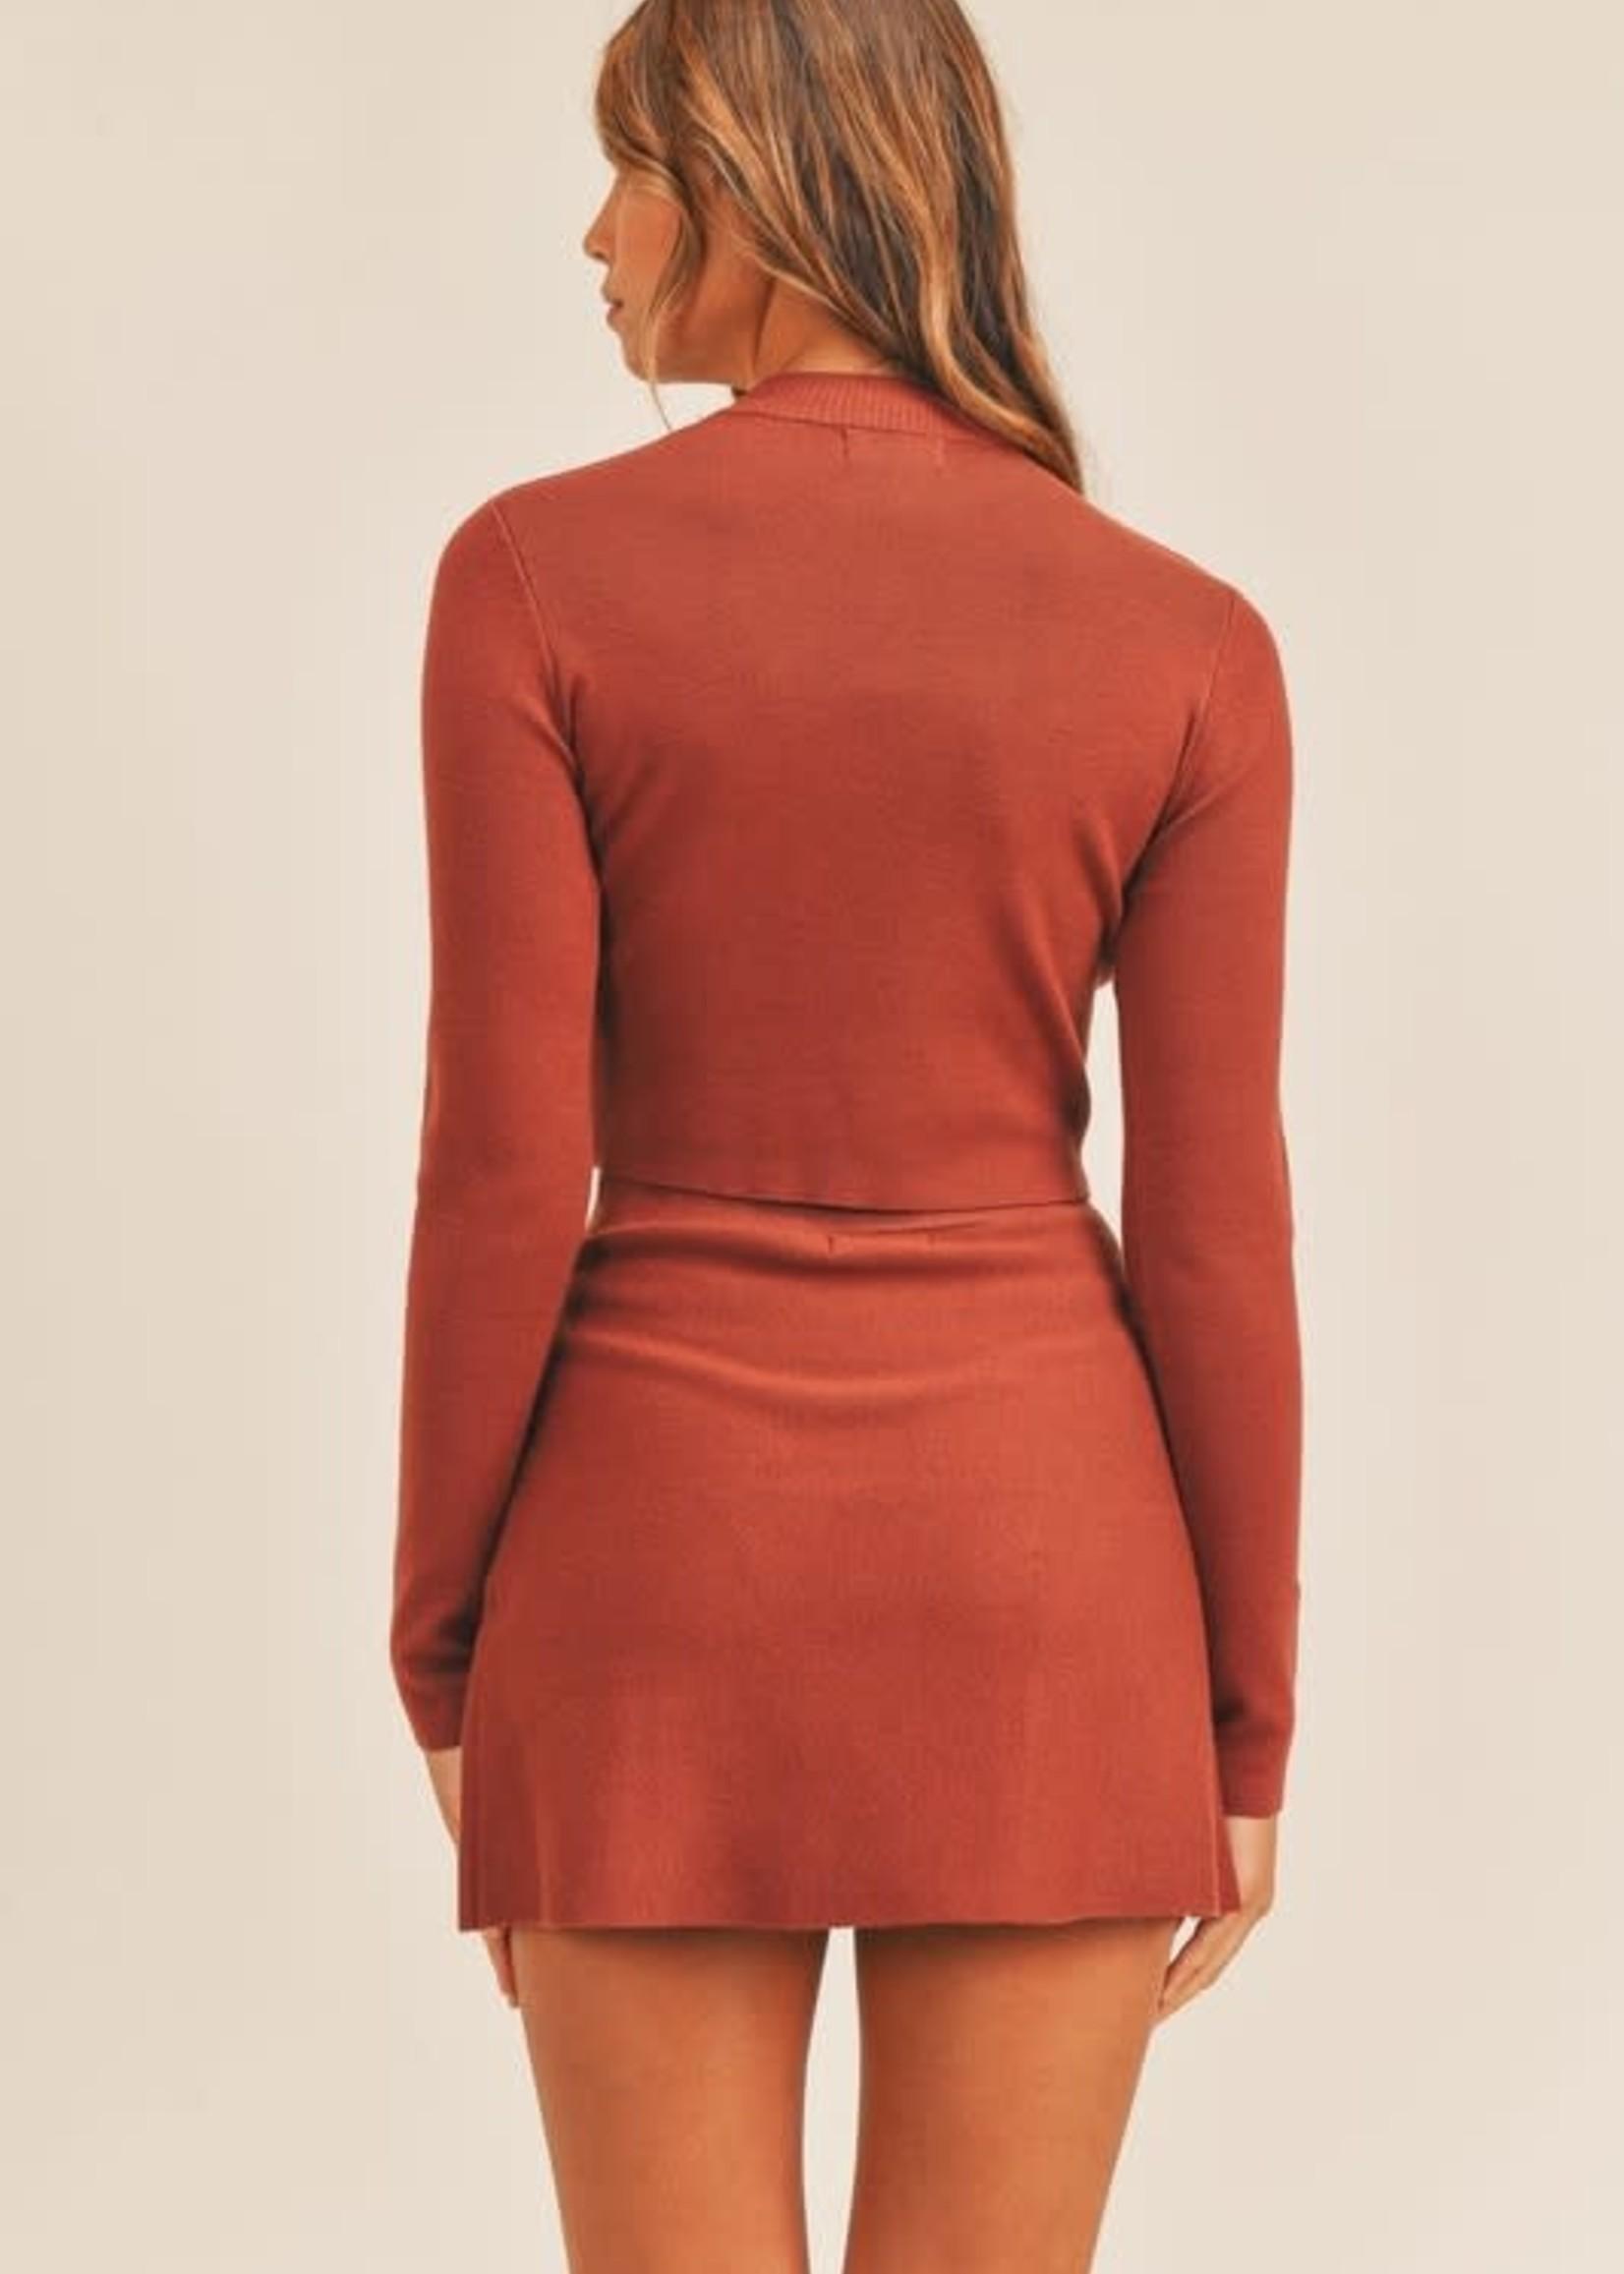 All The Fall Feels Rust Skirt